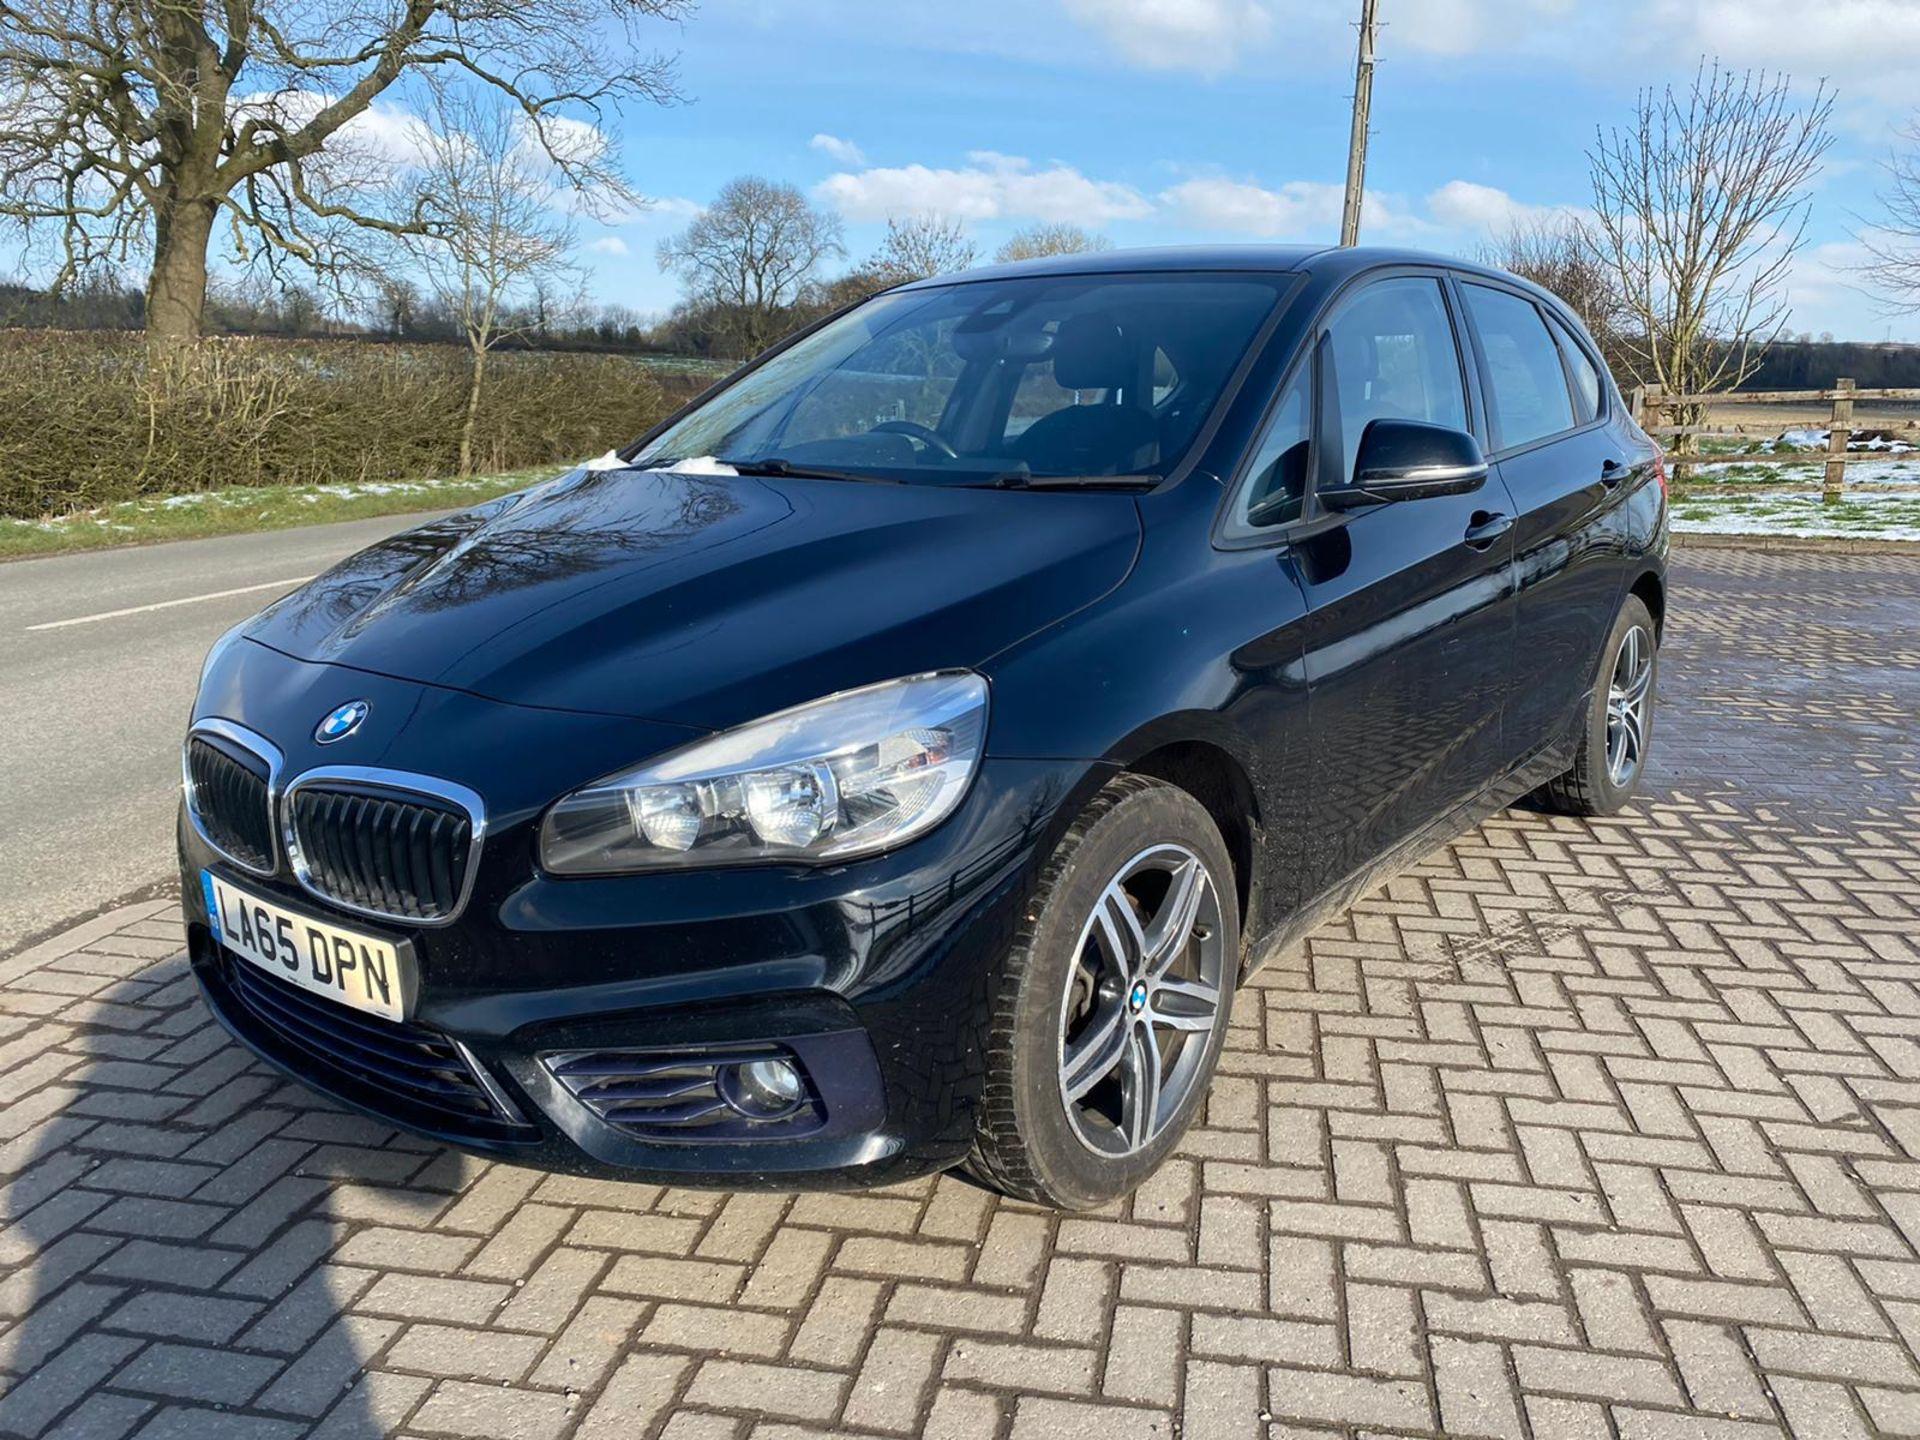 "ON SALE BMW 218d ""SPORT"" MPV 2.0 DIESEL ""EURO 6"" (2016 REG) - 1 OWNER - GREAT SPEC - BLACK - LOOK!! - Image 7 of 16"